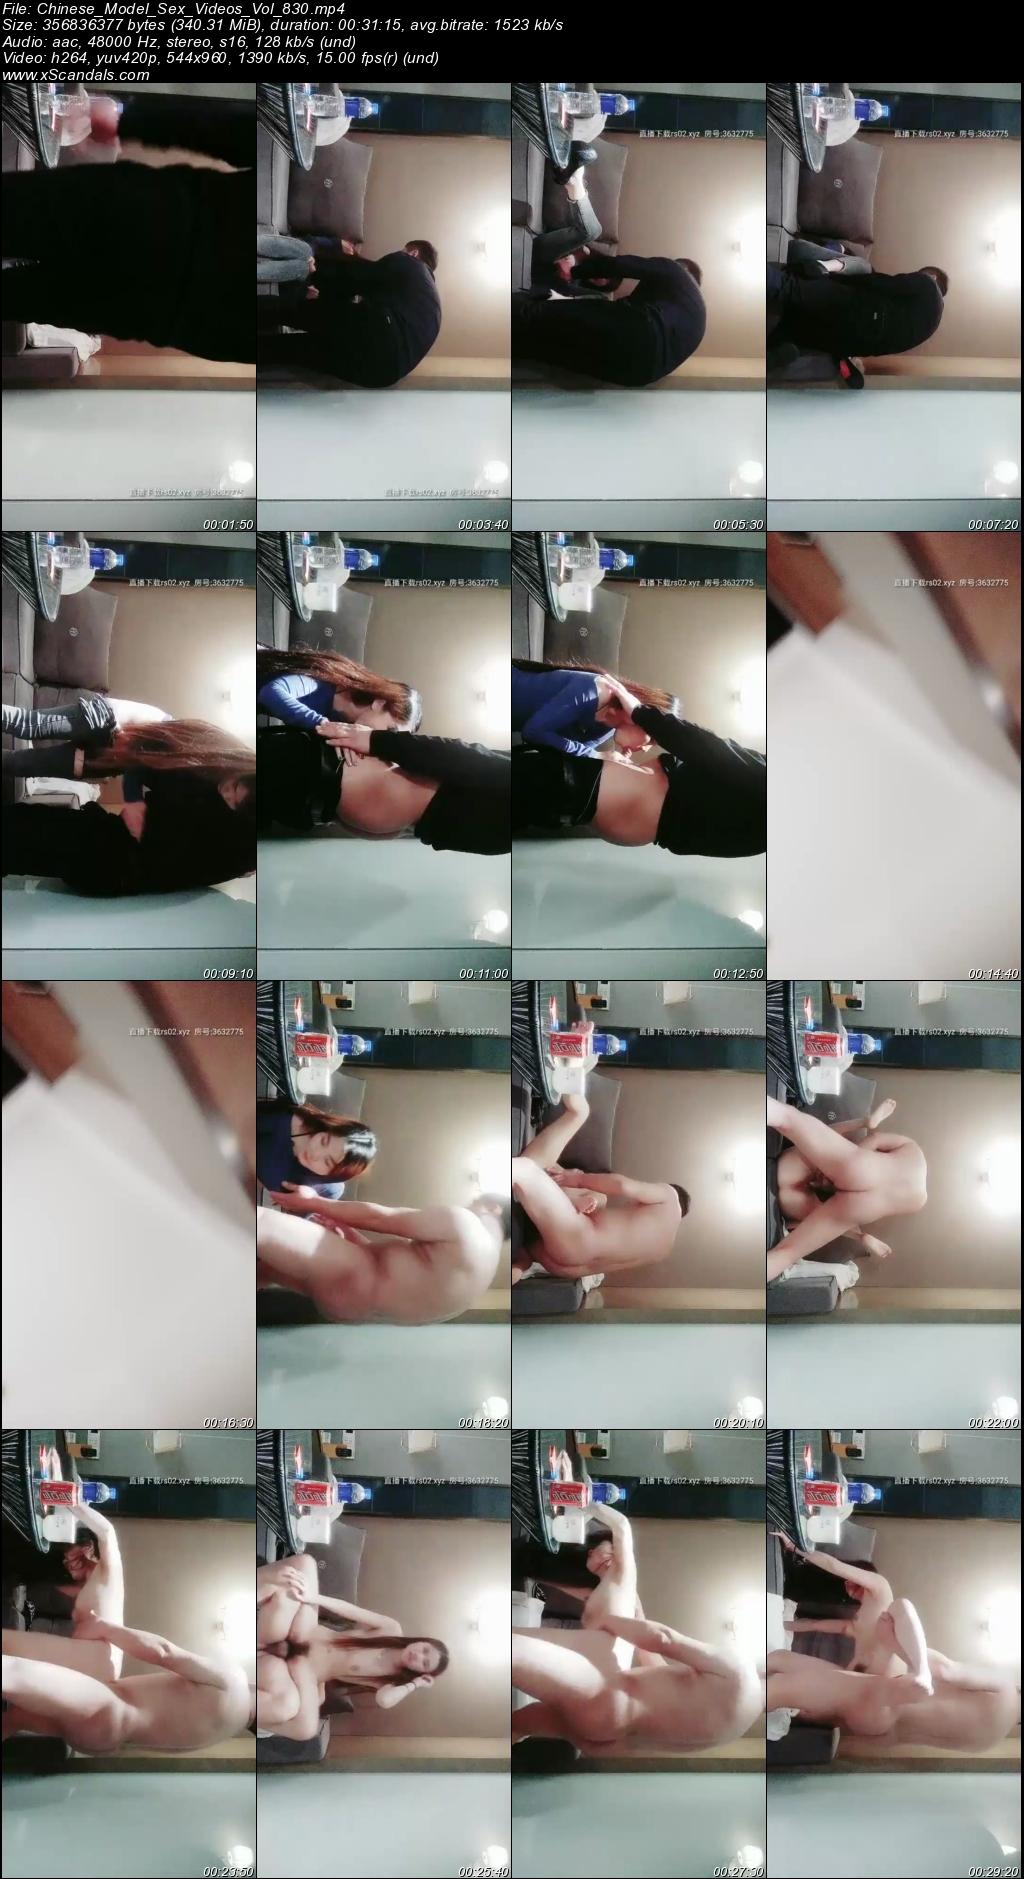 Chinese_Model_Sex_Videos_Vol_830.jpeg